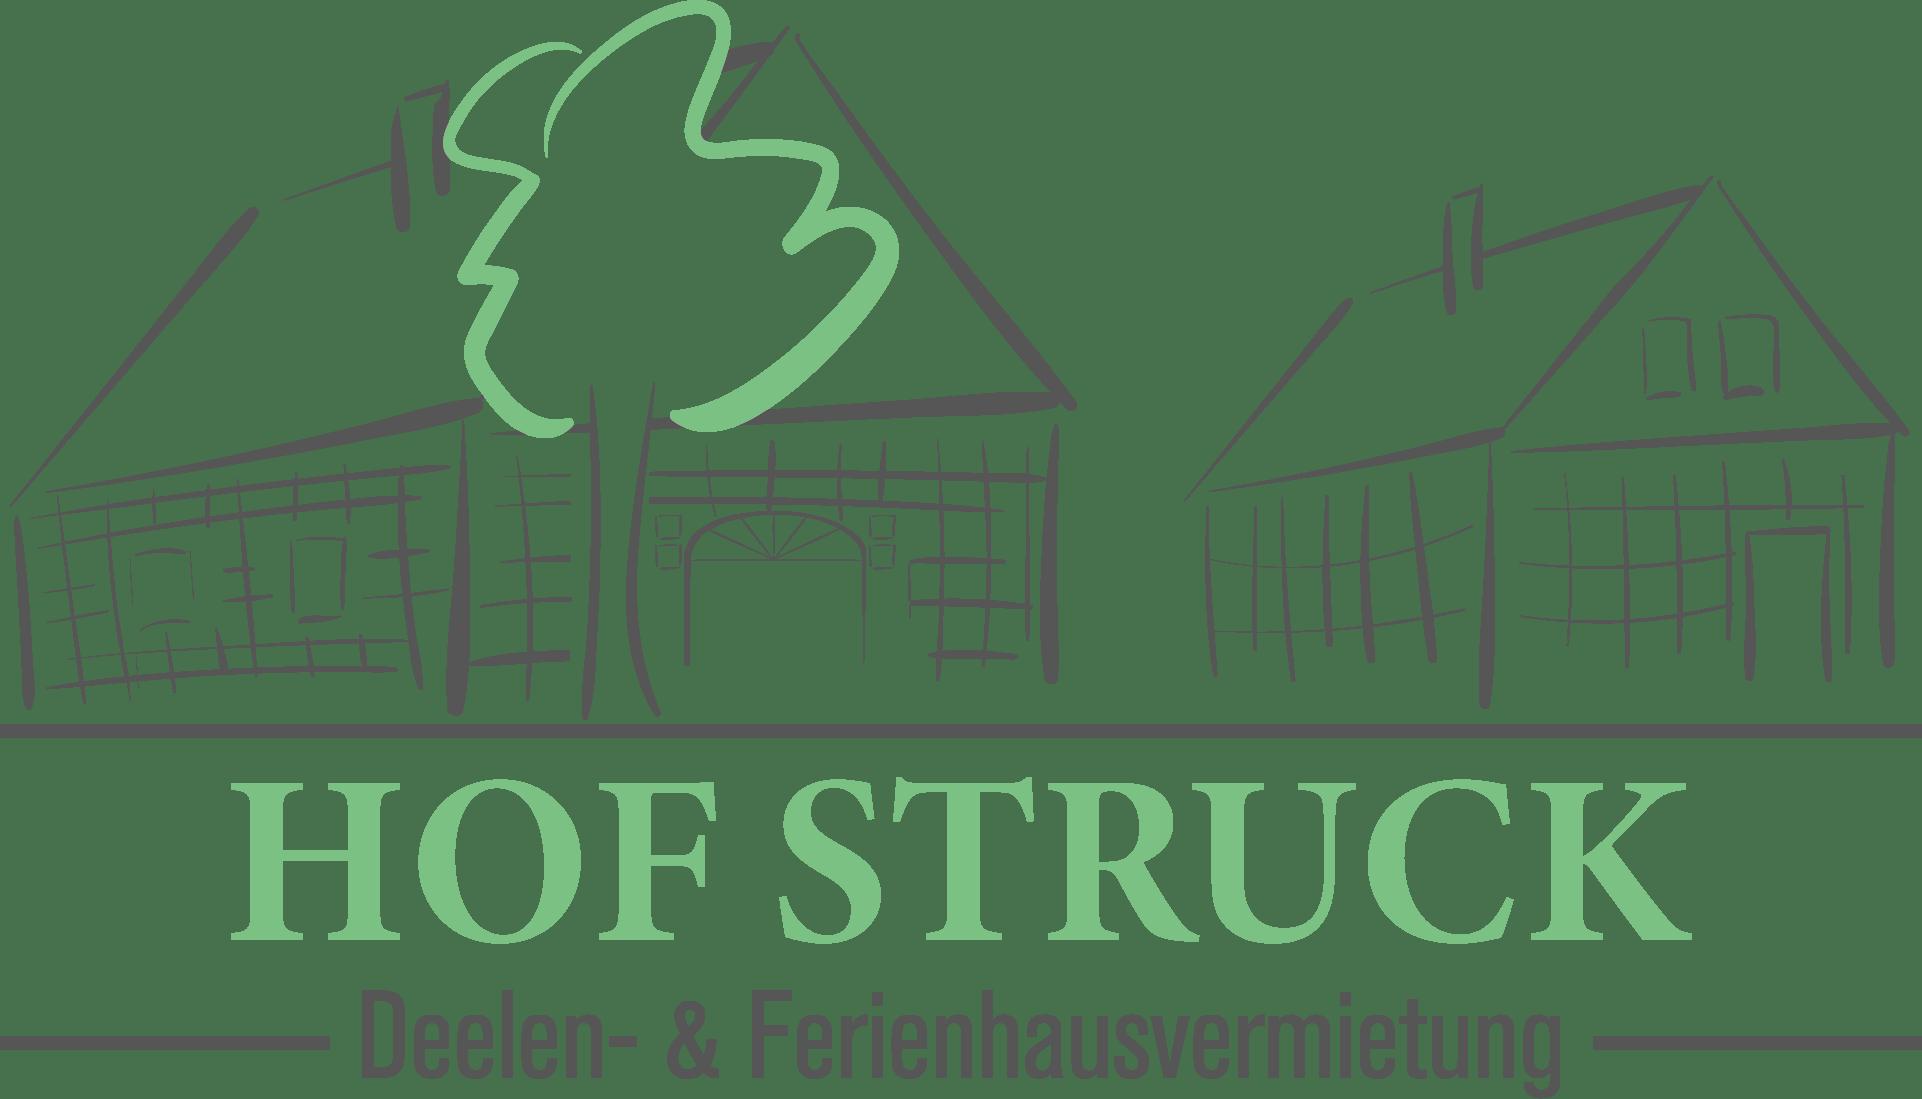 HOF STRUCK